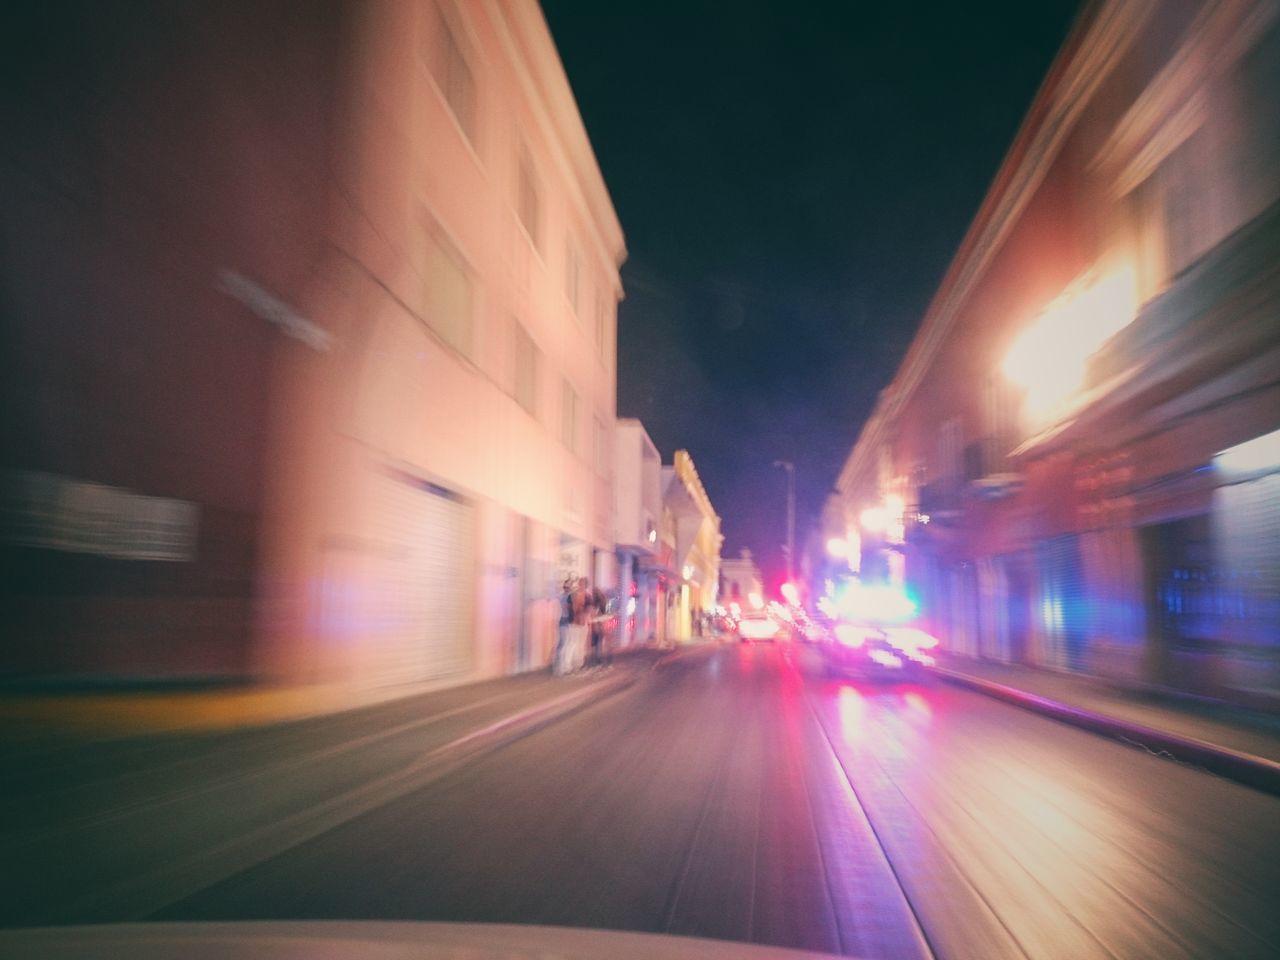 Policias. Night Photography Nightlife Yucatan Mexico Merida♡ Urban Photography Outdoors Xperia ZL Street Photography City Life Mobile Photography Running Night Shot Mérida Yucatán Police Car Lightpainting Light Effect Long Exposure Photography Welcome To Black